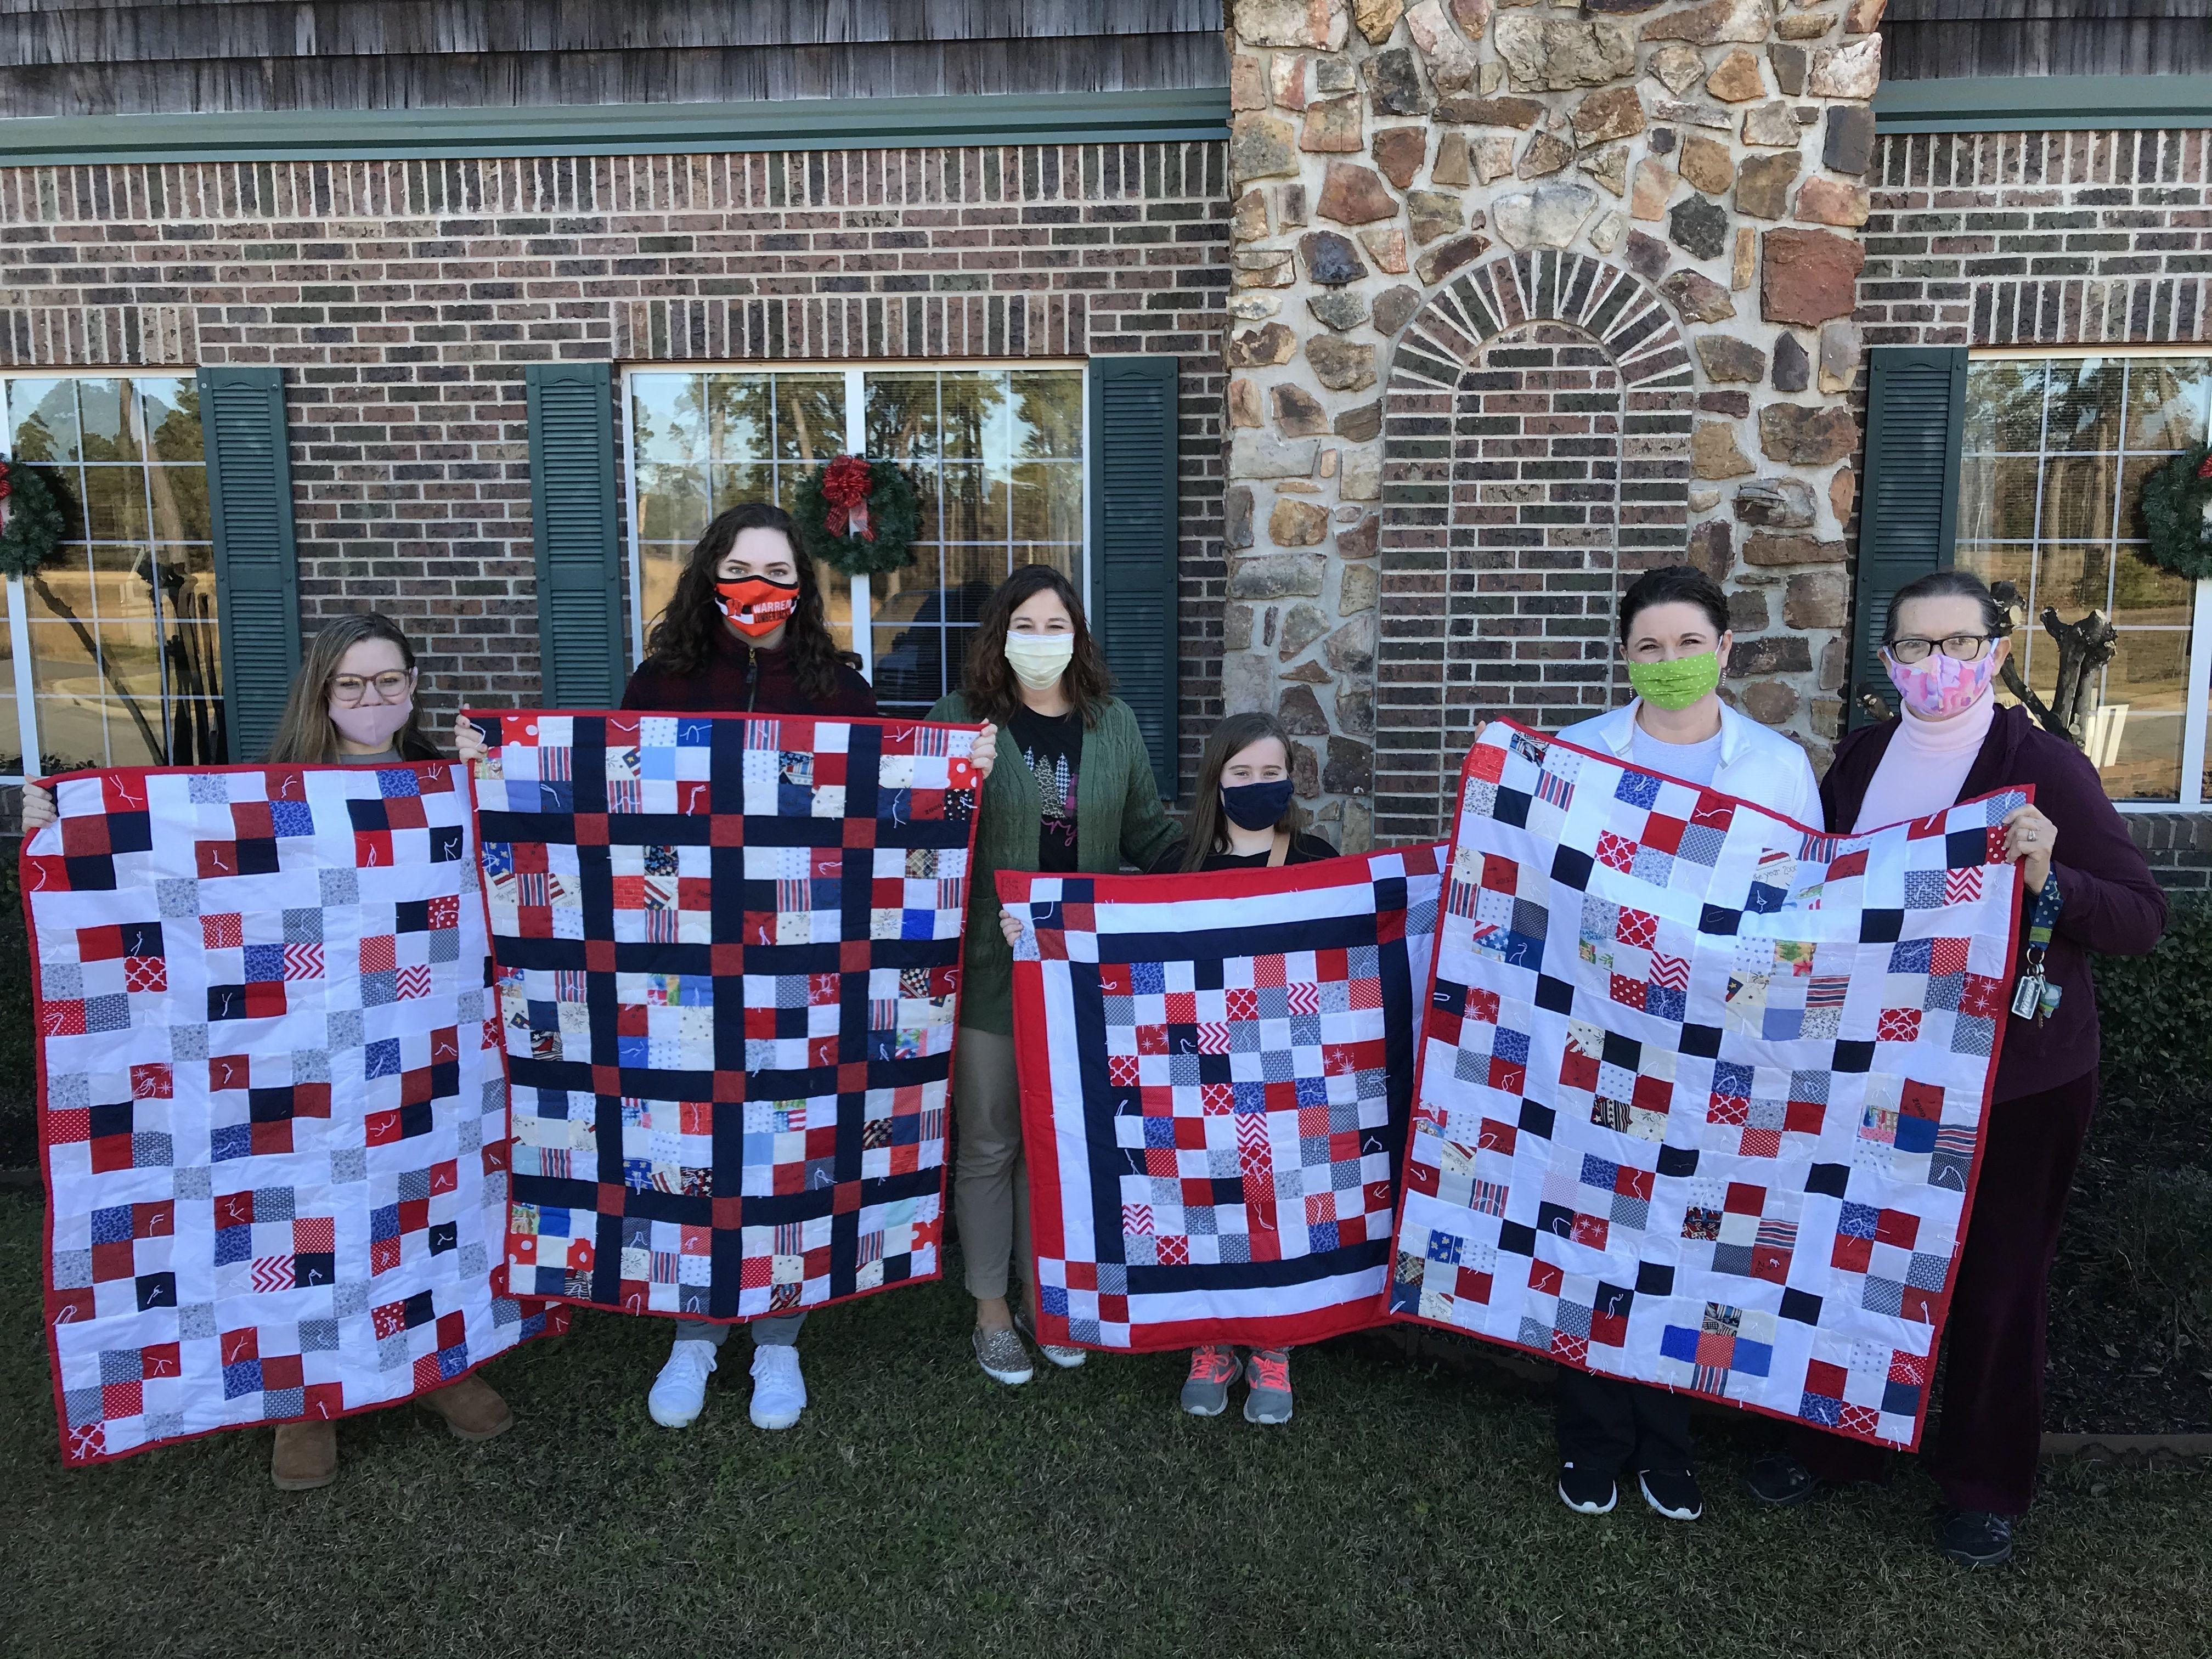 Bradley County 4-H Club Quilt Donation